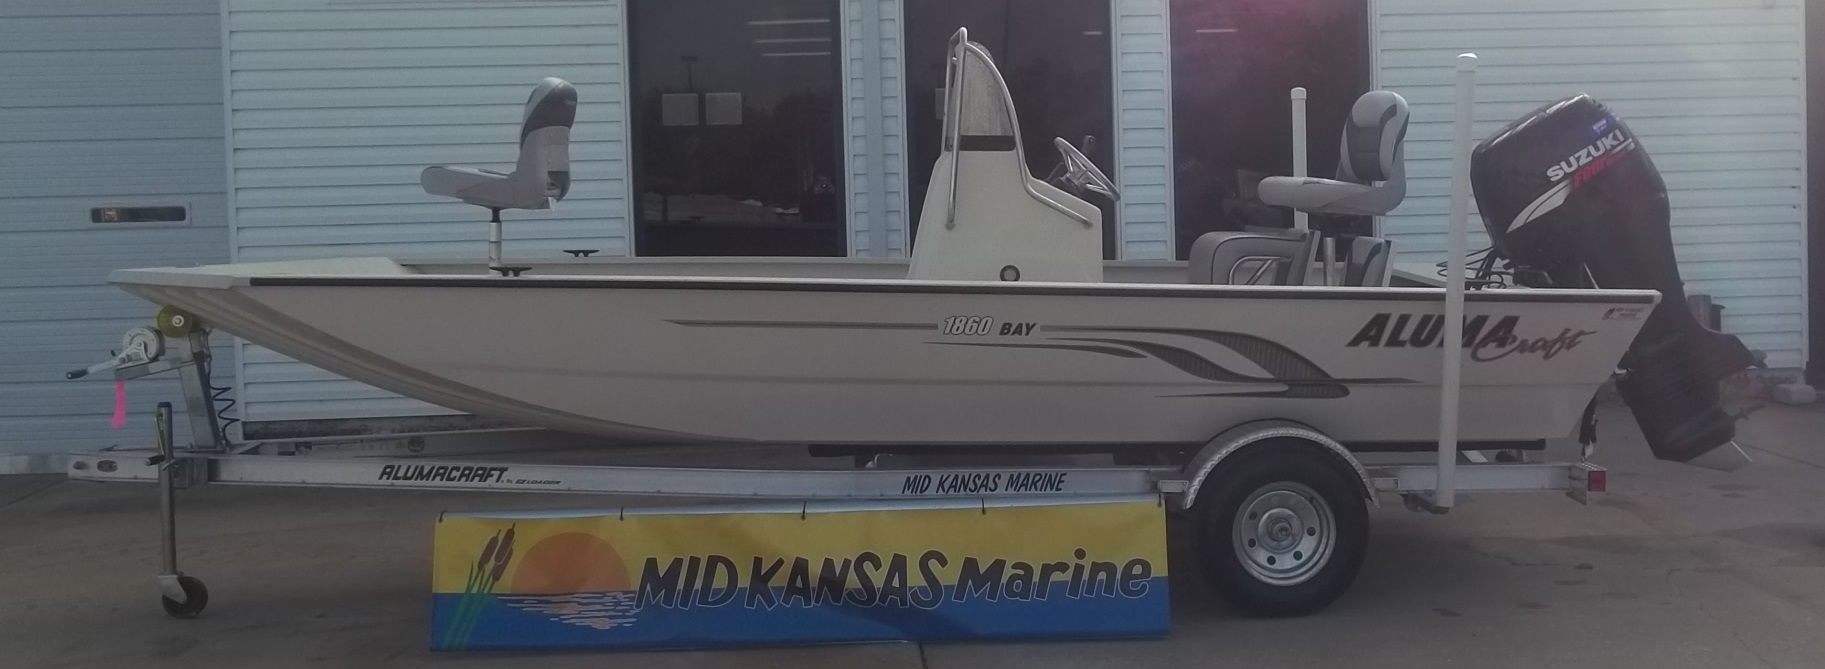 2015 Alumacraft 1860 Bay CC